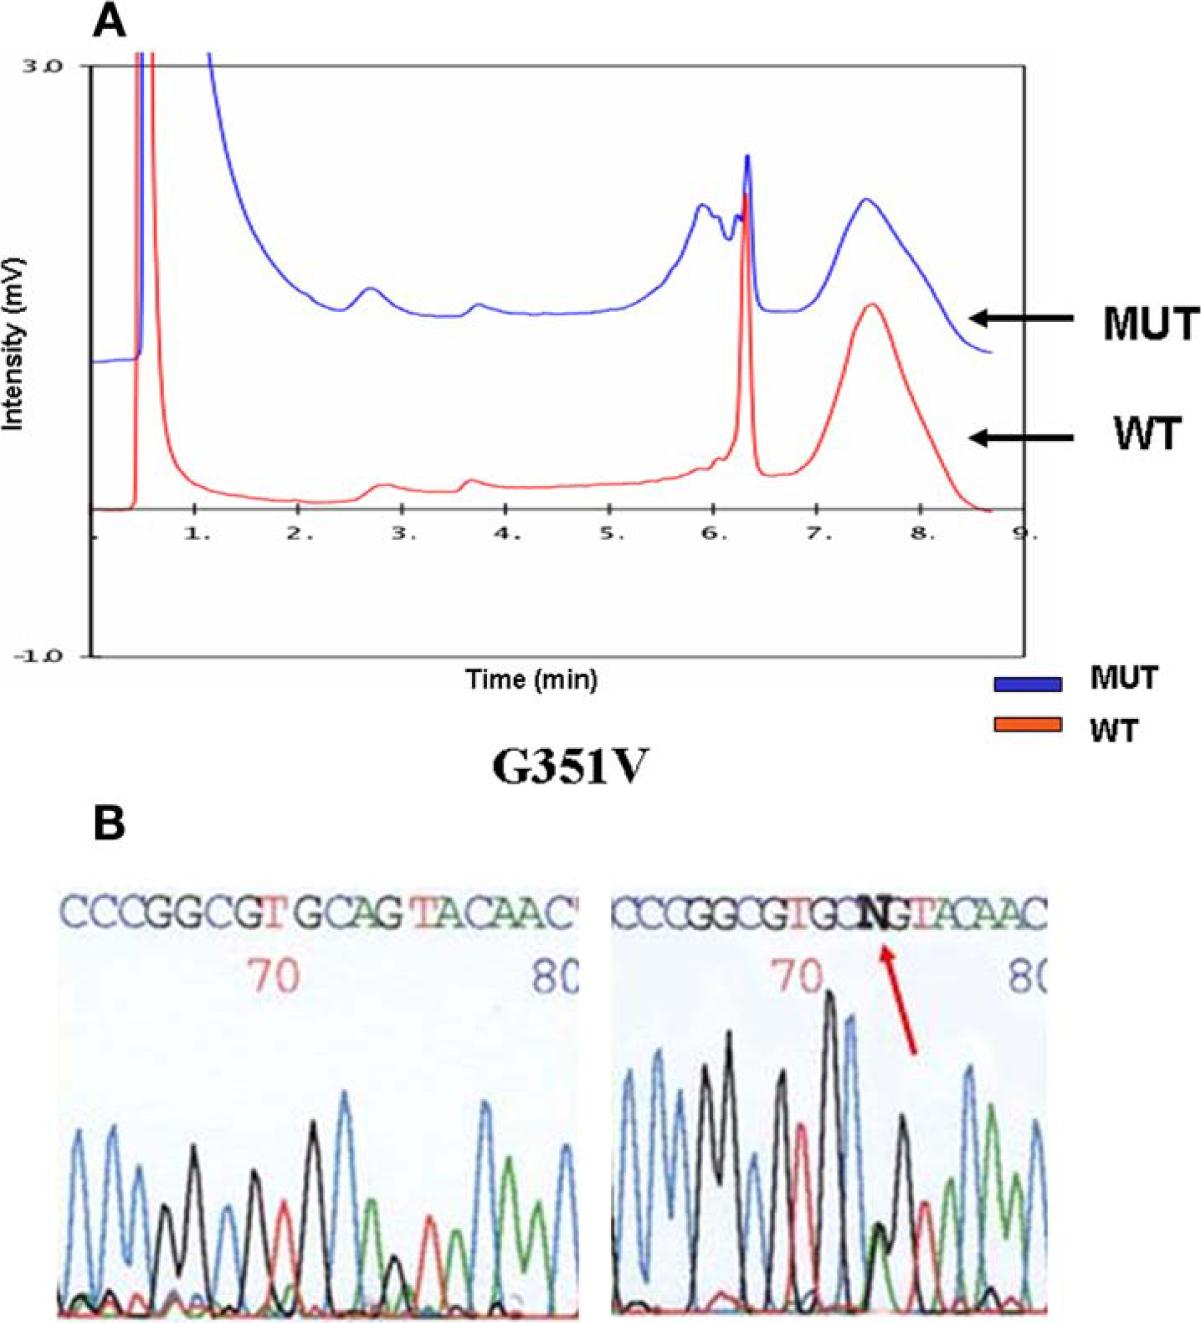 Mutation Screening For The Genes Causing Cardiac Arrhythmias Filter Air Inline Hexagonal St 100 Grade A Open Image In New Window